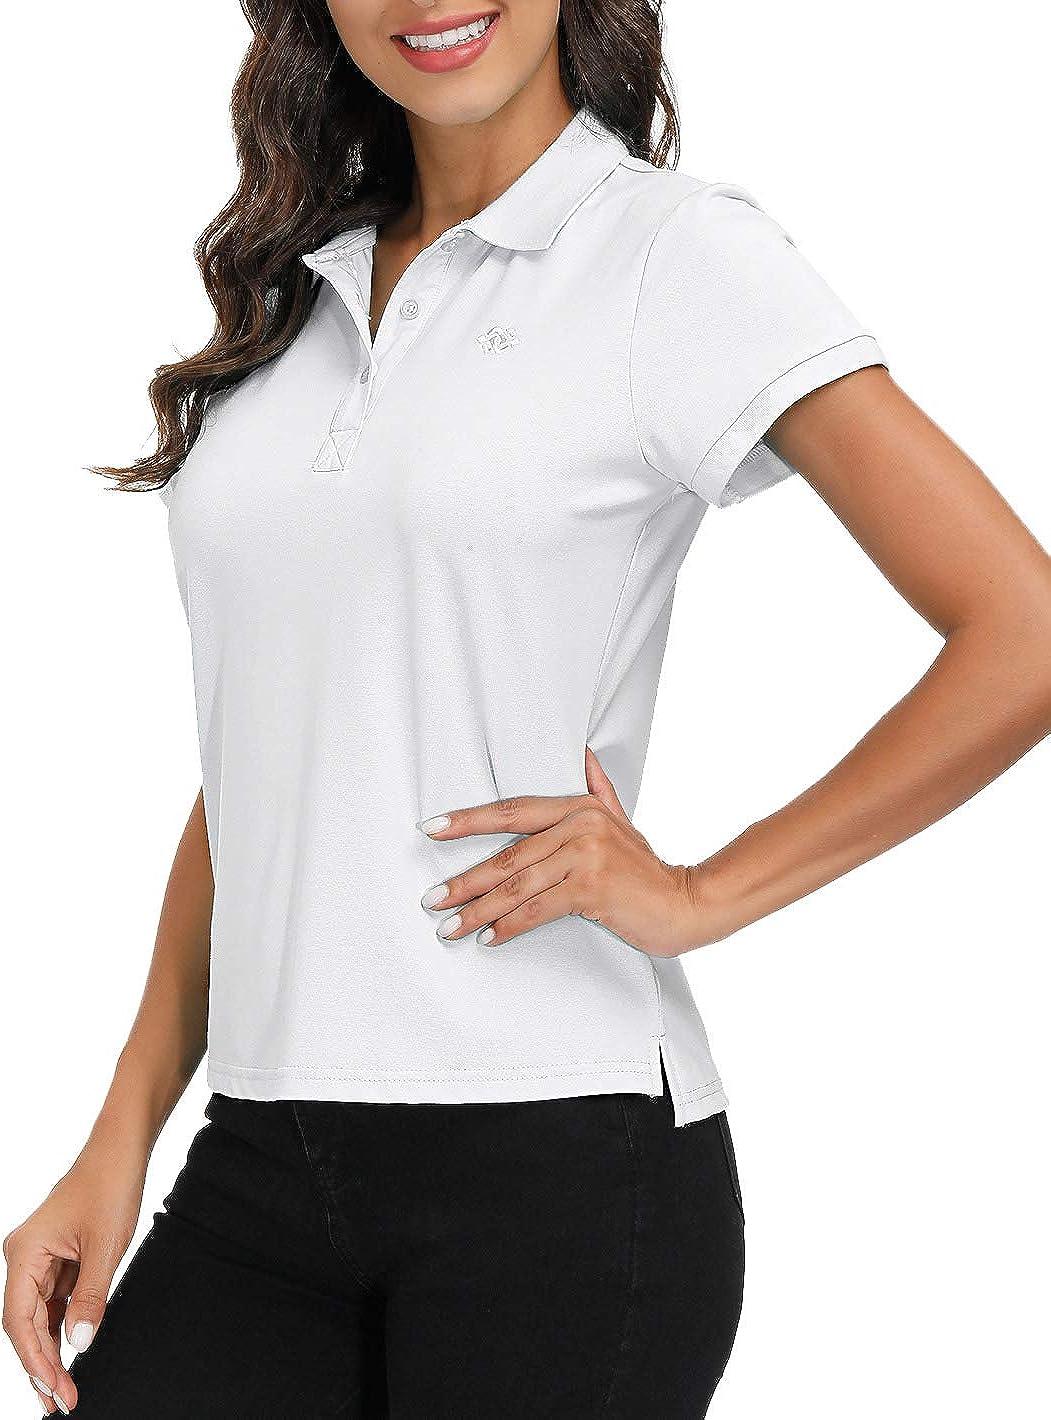 AjezMax Womens Arlington Mall Polo Shirt Sale item Golf Quick Basic Dry Sport Short